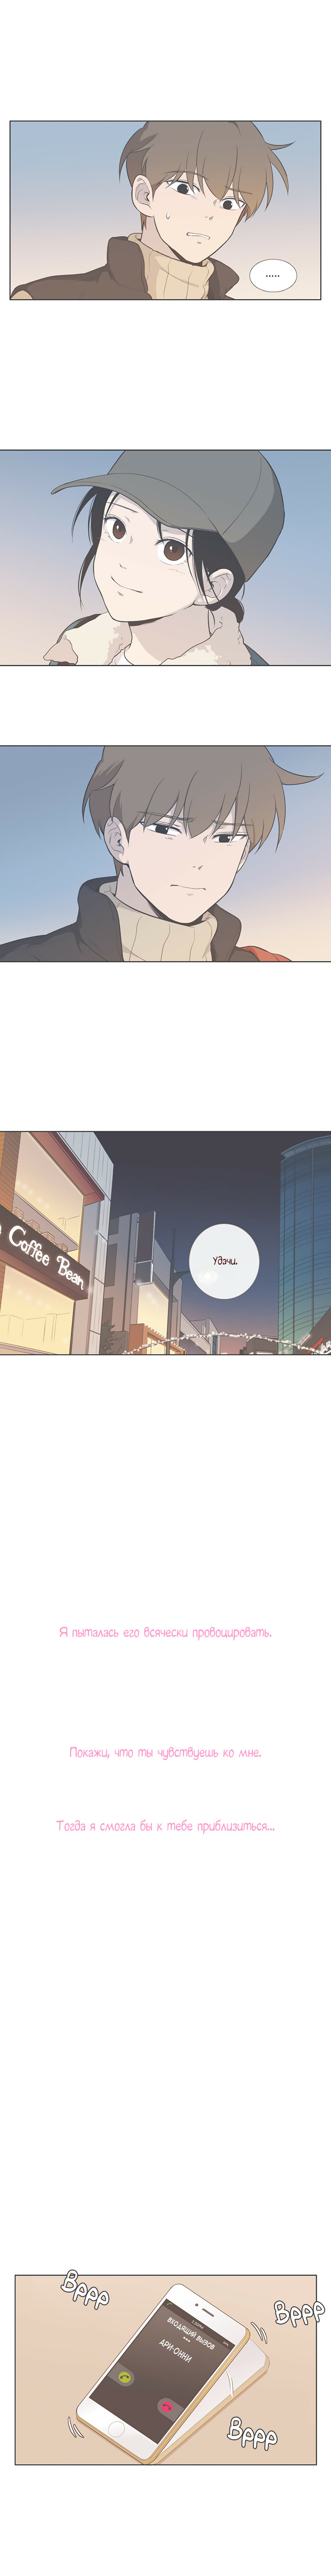 https://r1.ninemanga.com/comics/pic2/12/22860/419708/1534422454516.jpg Page 10